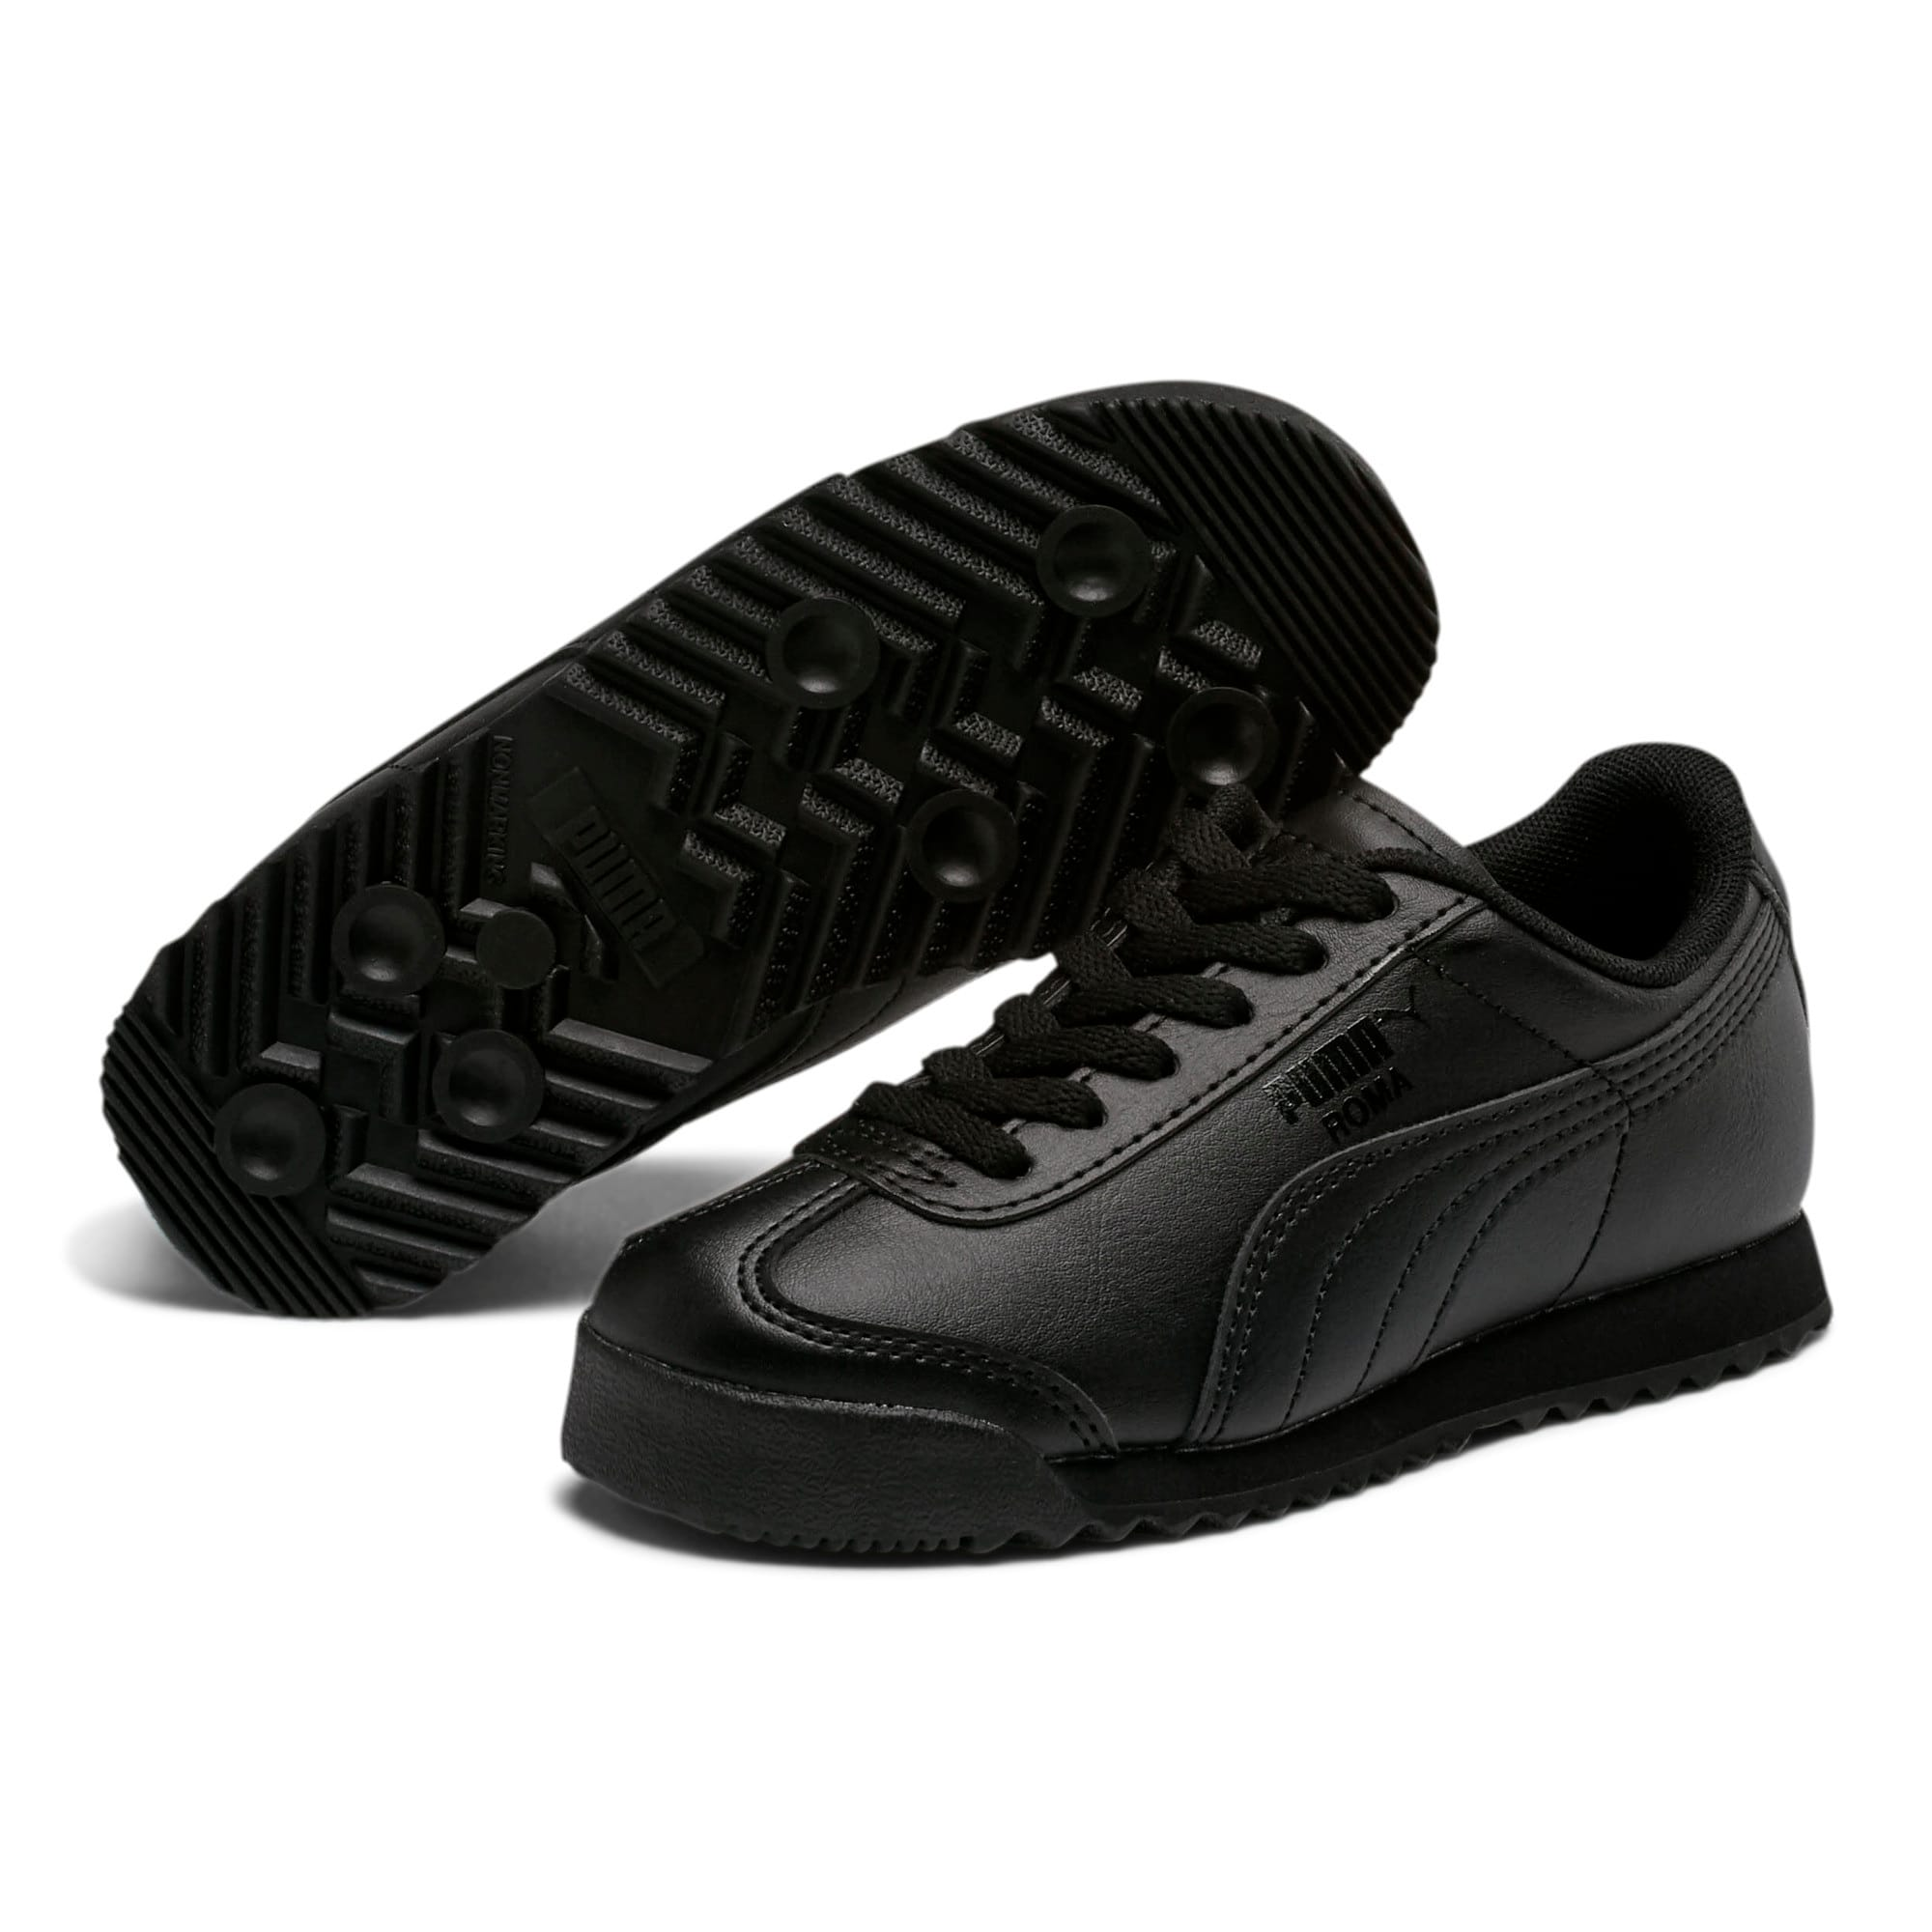 Thumbnail 2 of Roma Basic Little Kids' Shoes, Puma Black-Puma Black, medium